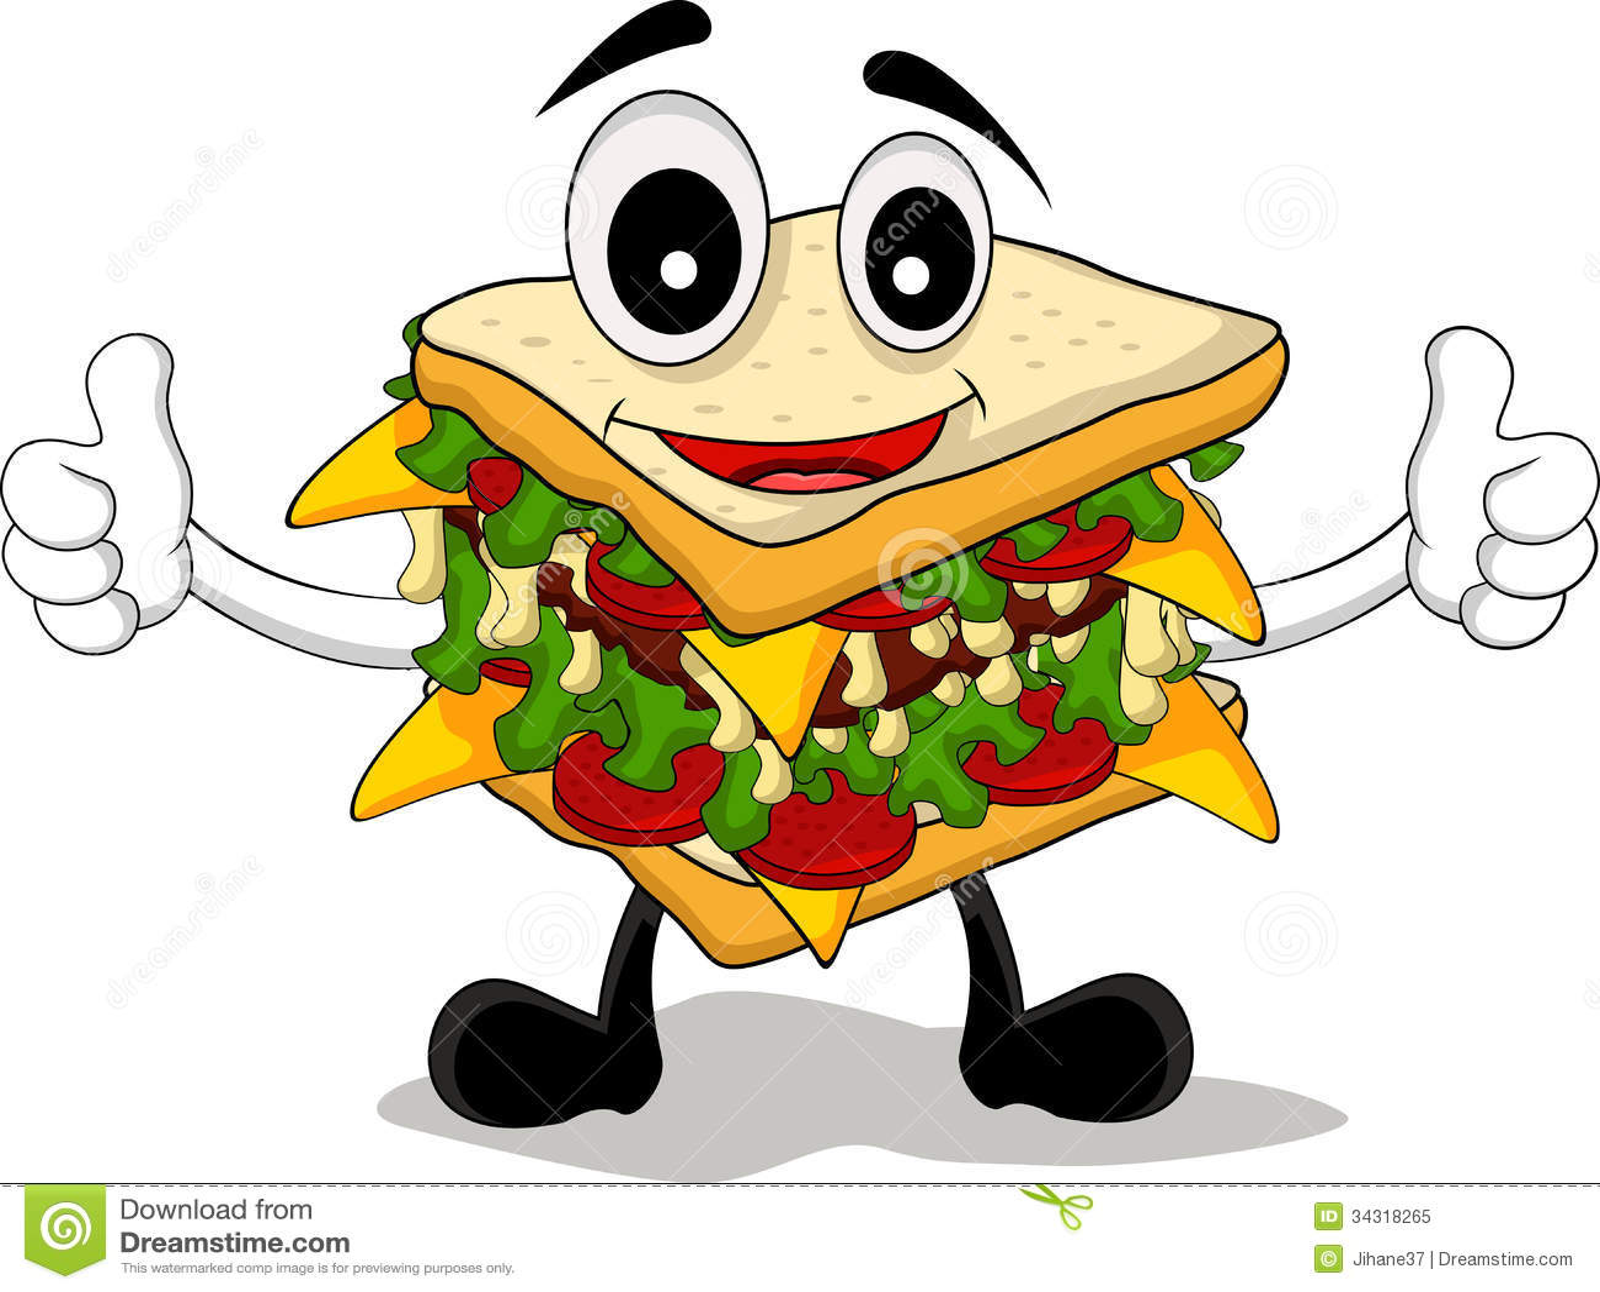 sandwich cartoon thumb up stock illustration illustration of gesture 34318265 dreamstime com